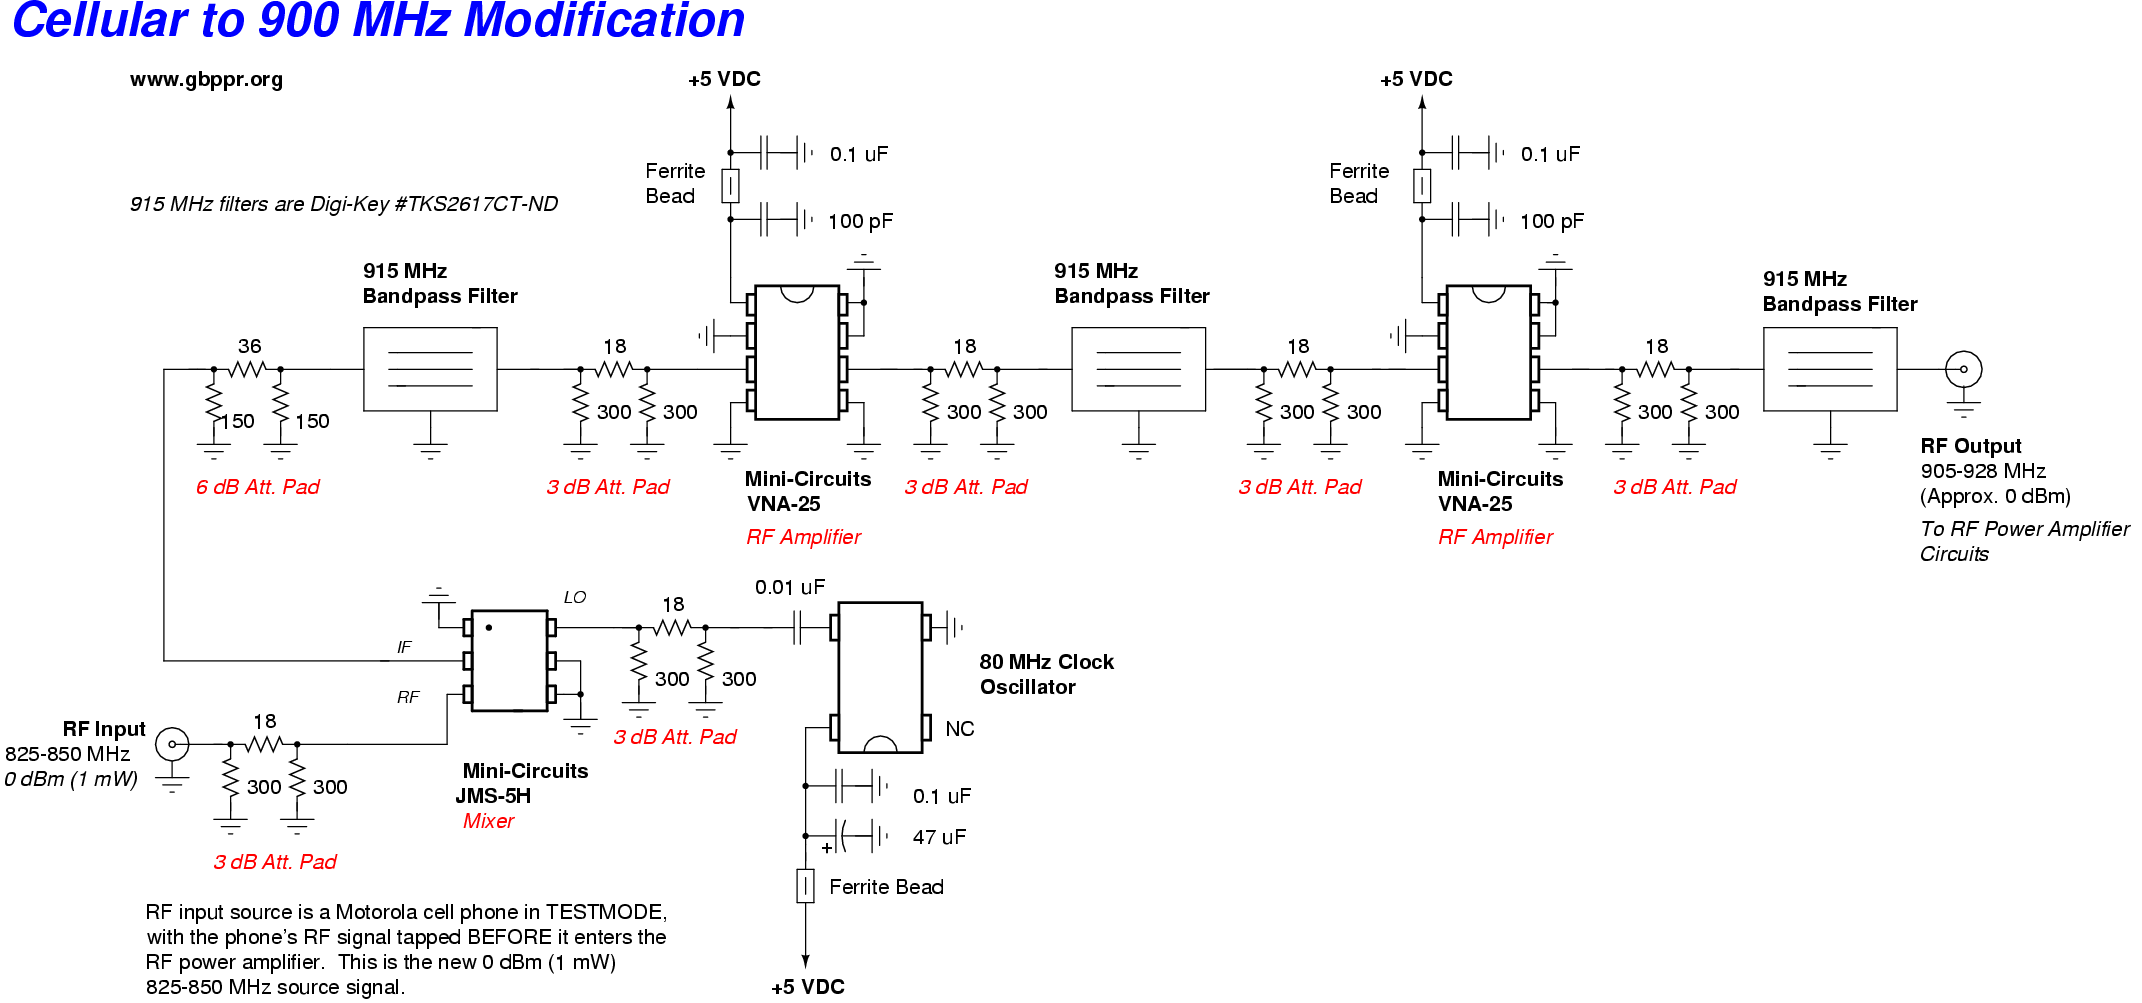 Converting Cellular Phones To 900 Mhz Att Phone Jack Wiring Diagram Schematic